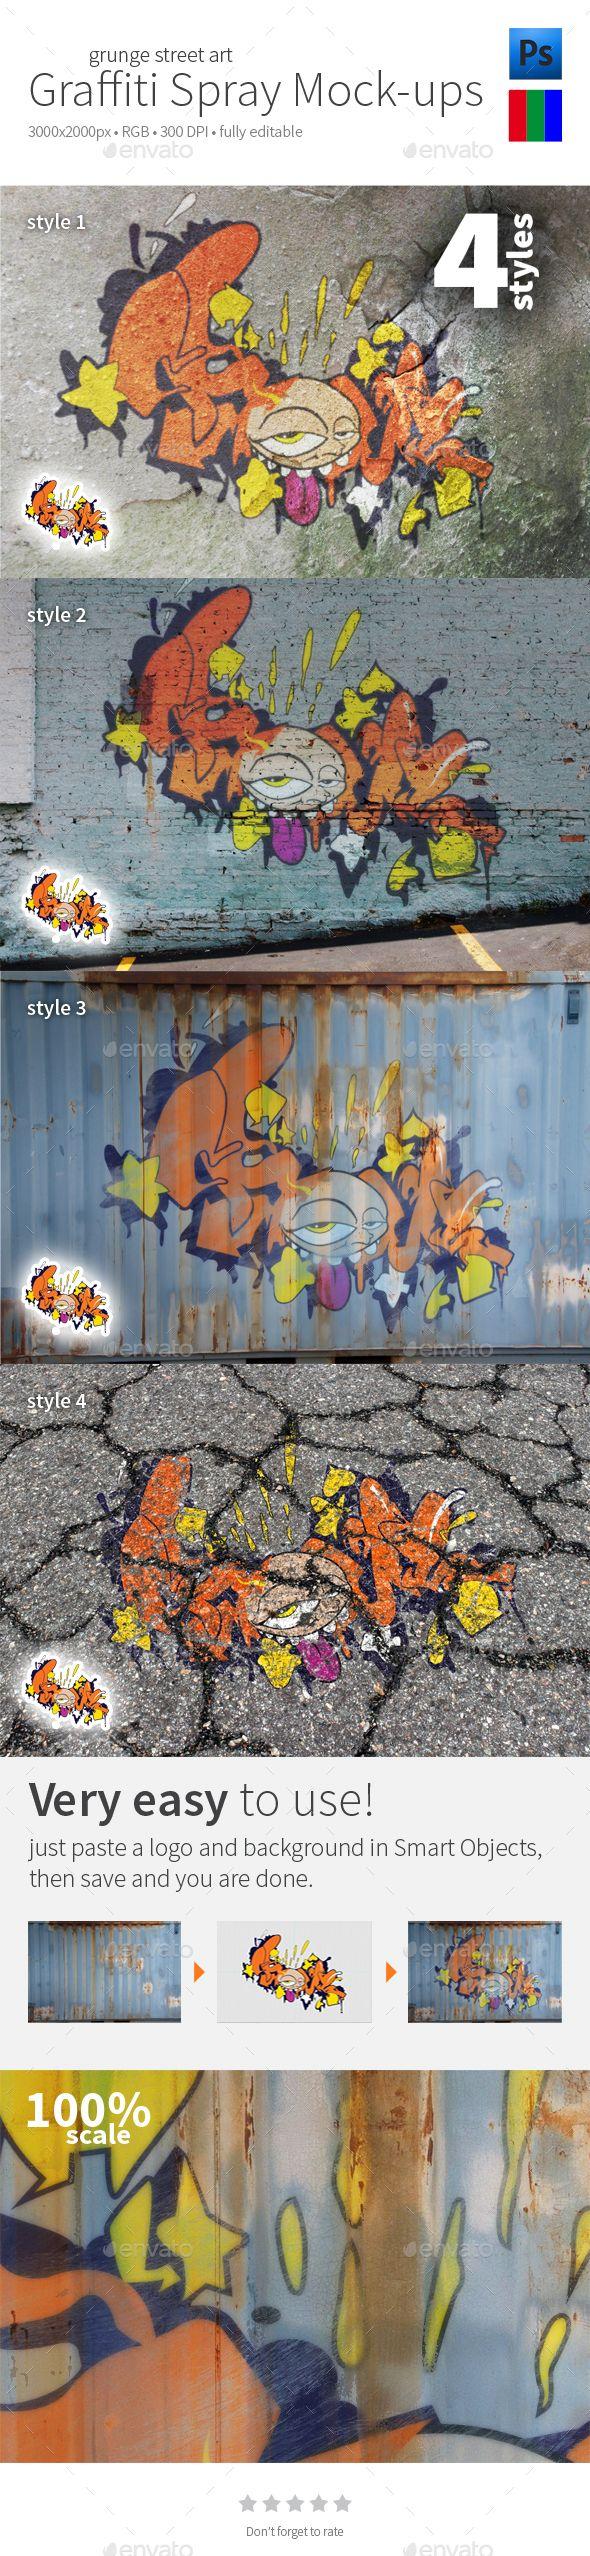 graffiti spray paint omql - photo #44